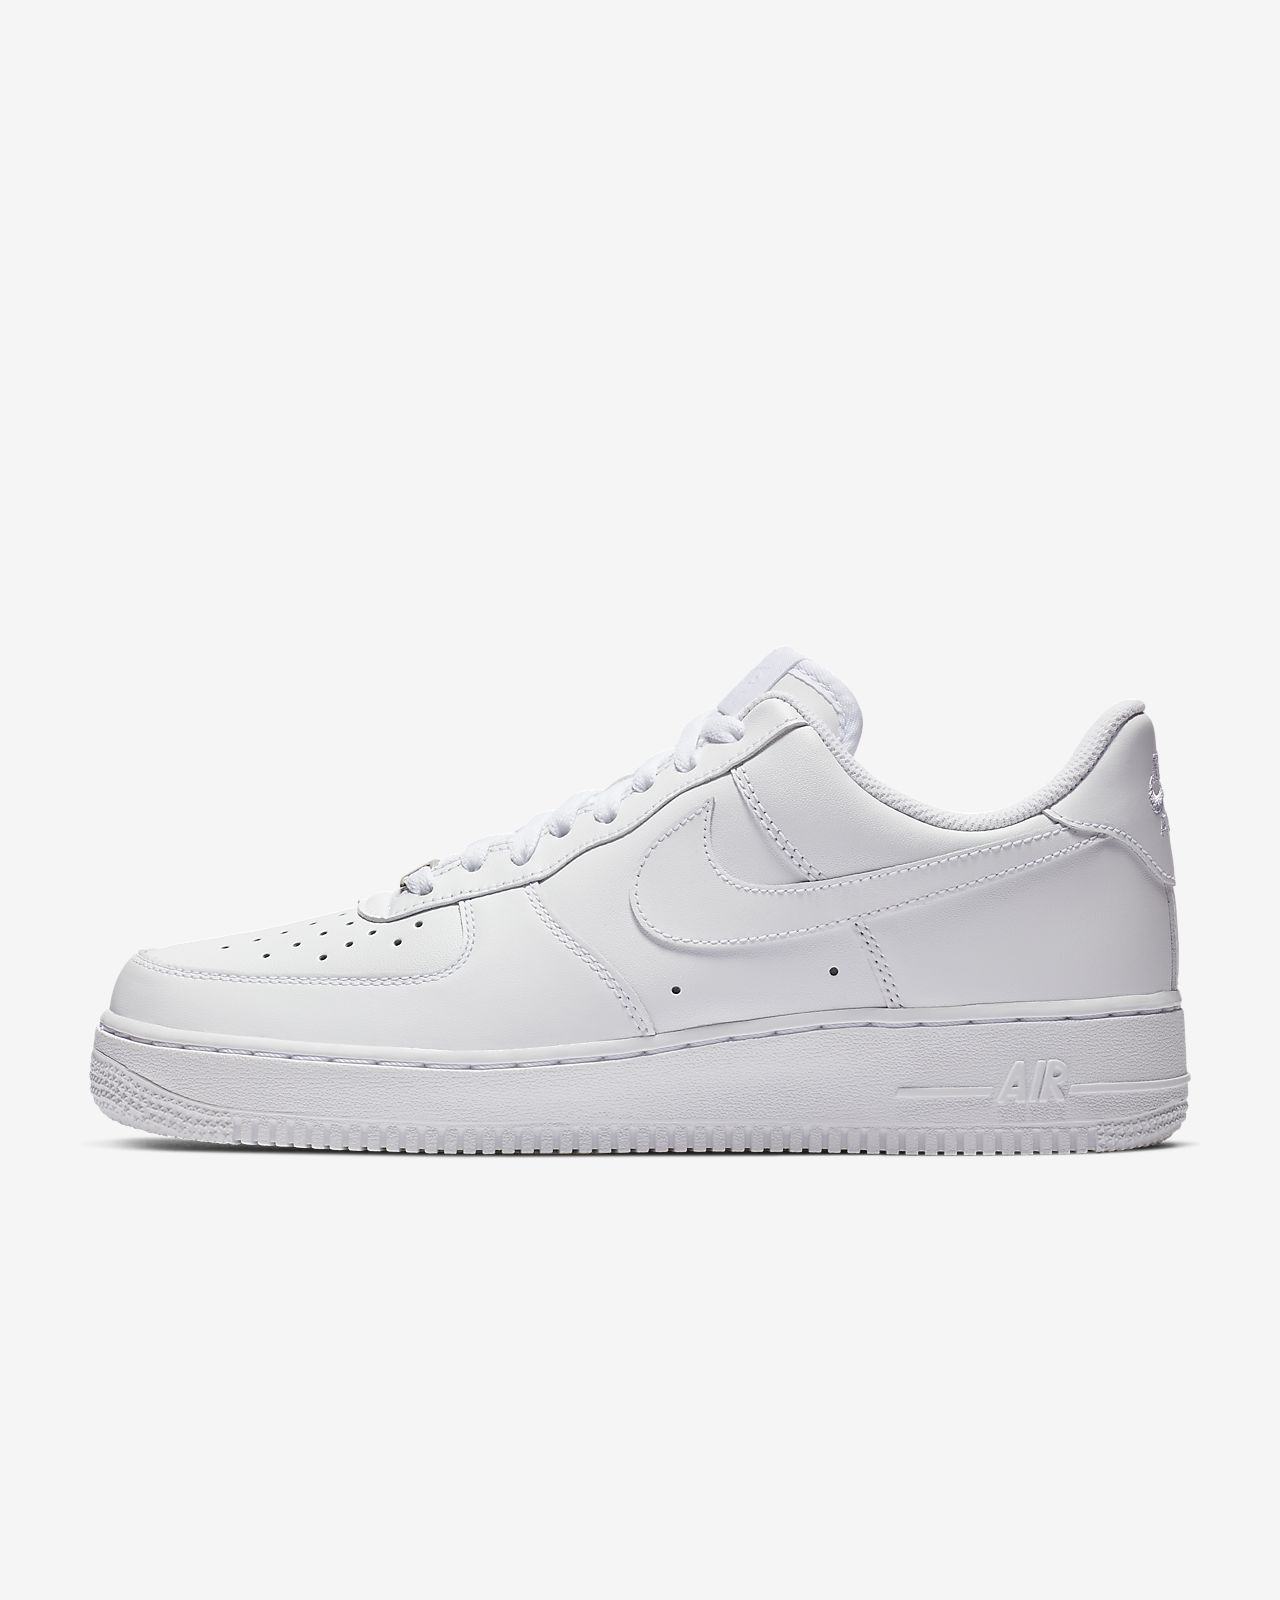 Nike Air Force 1 '07 Triple White Damesschoen